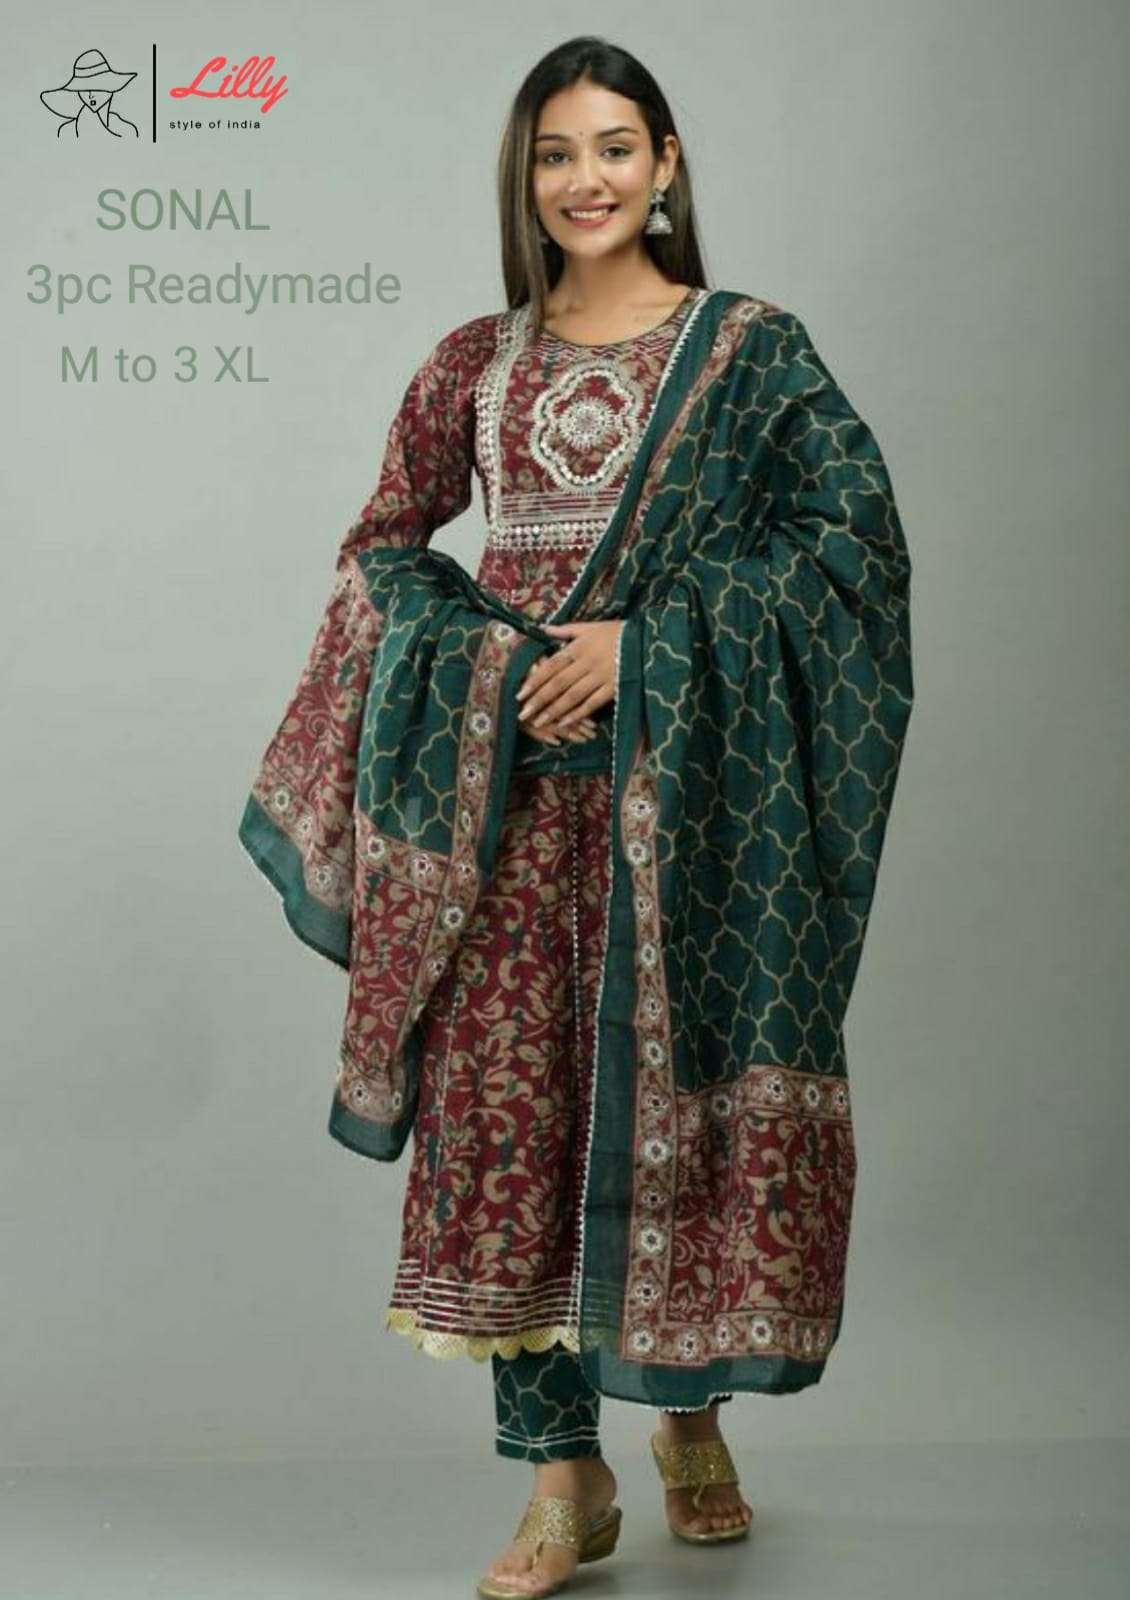 Lilly Sonal Exclusive Anarkali Kurti Bottom Dupatta Set New Collection